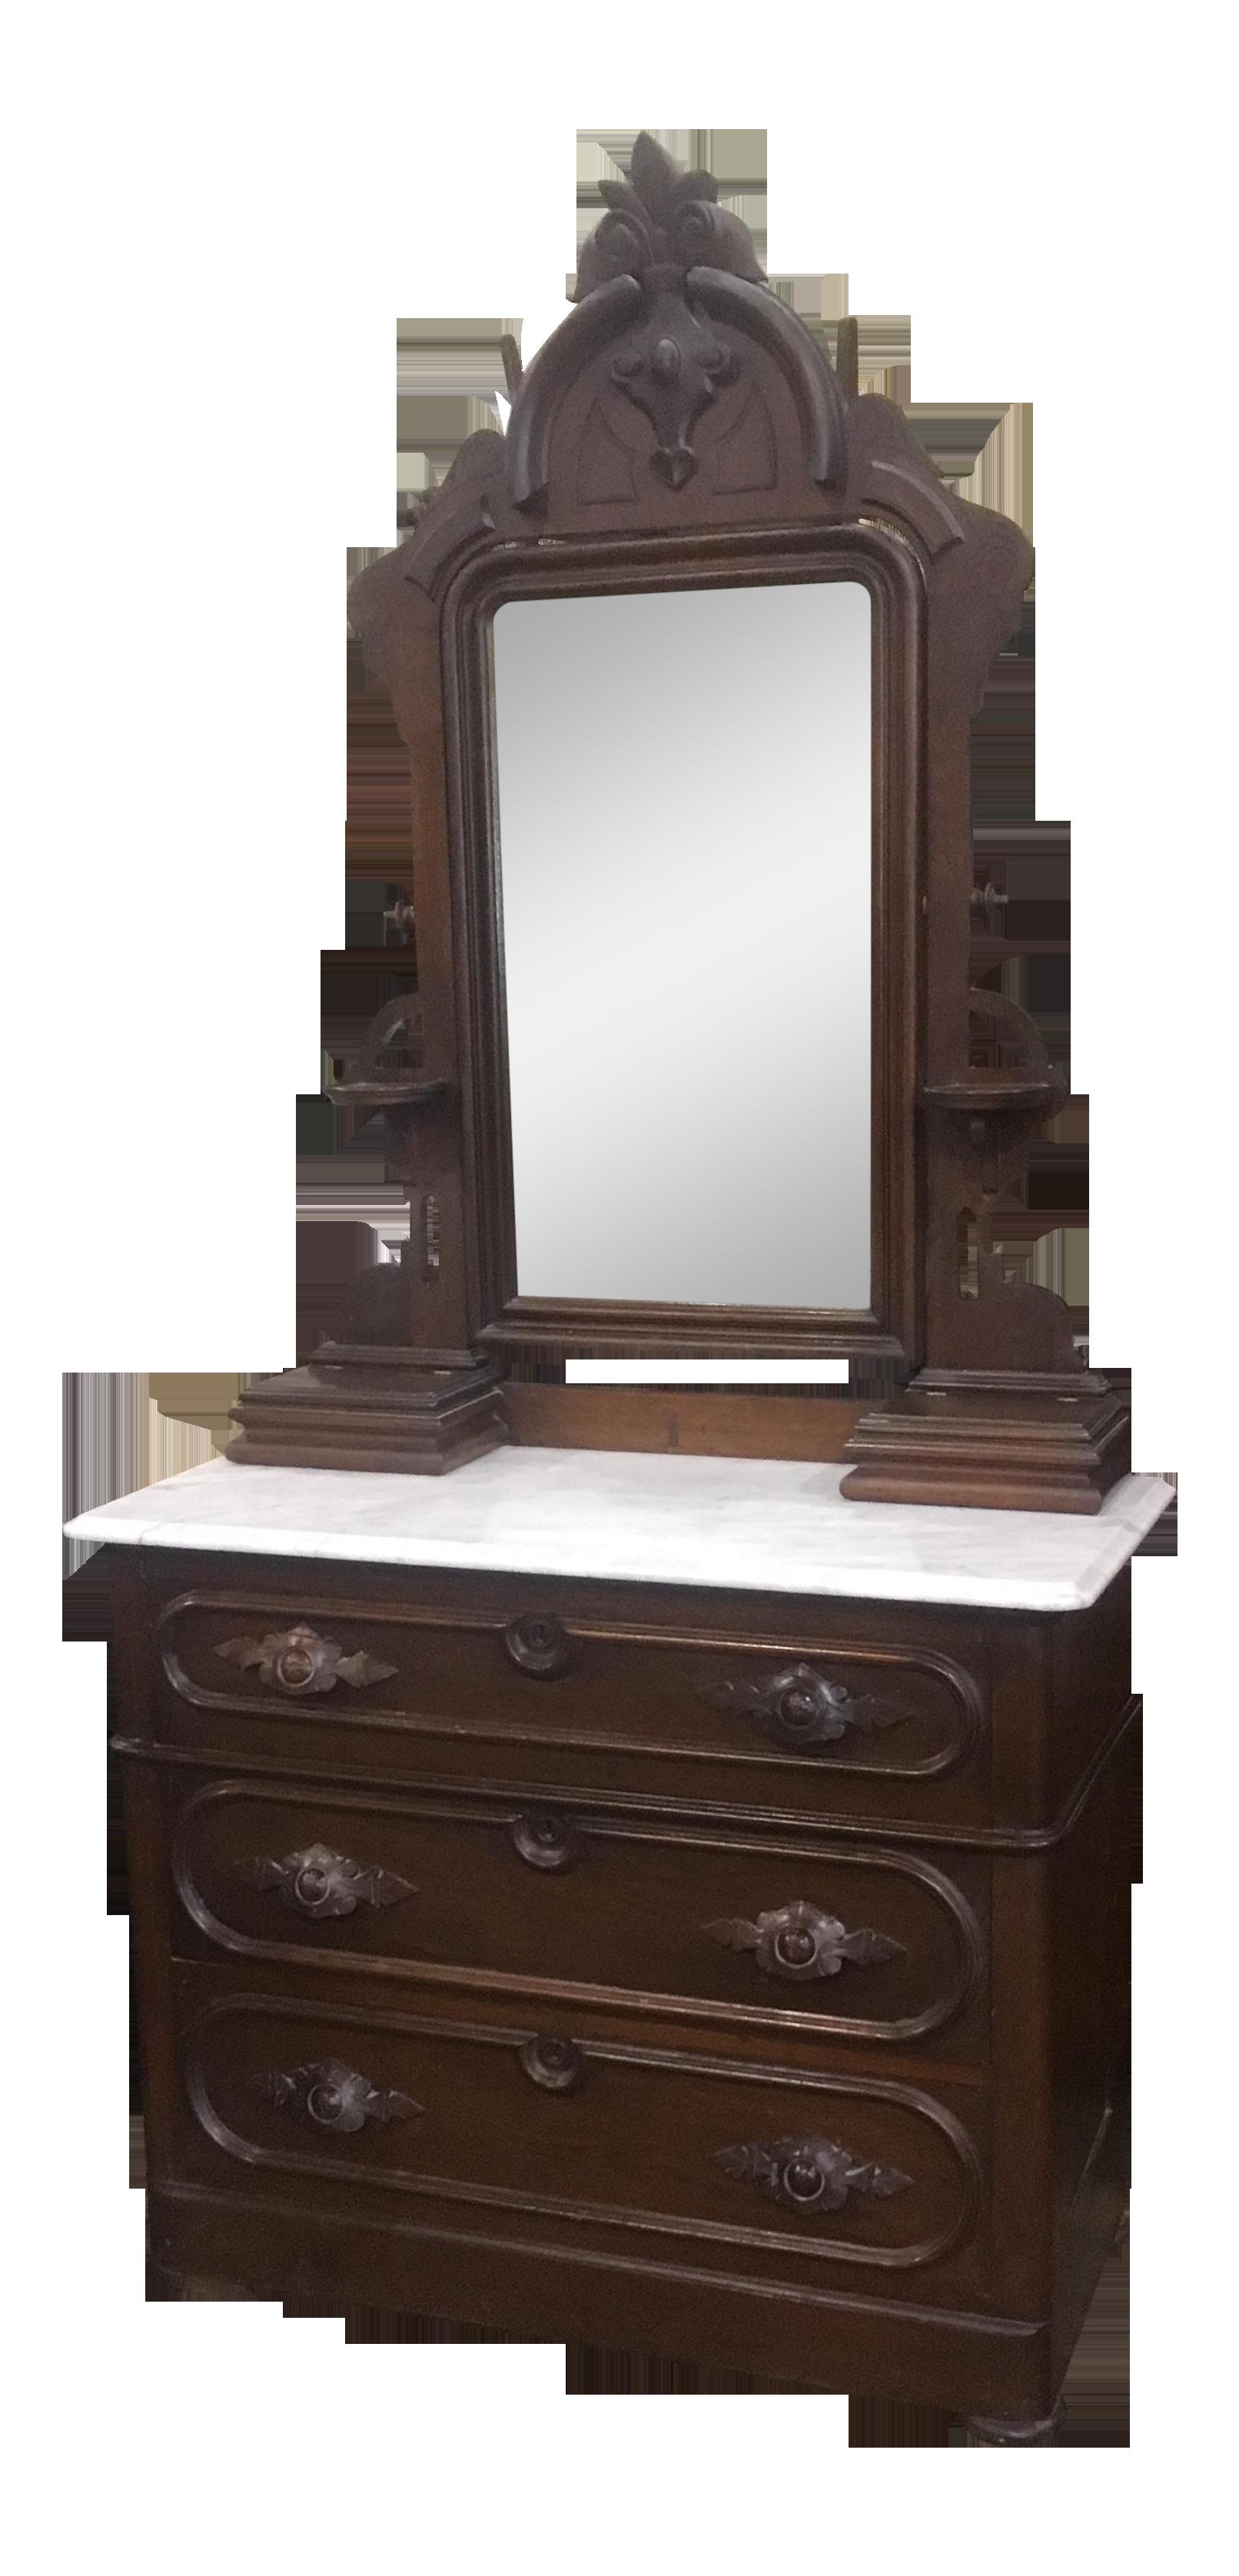 Antique Victorian Marble Top Dresser and Mirror | Chairish